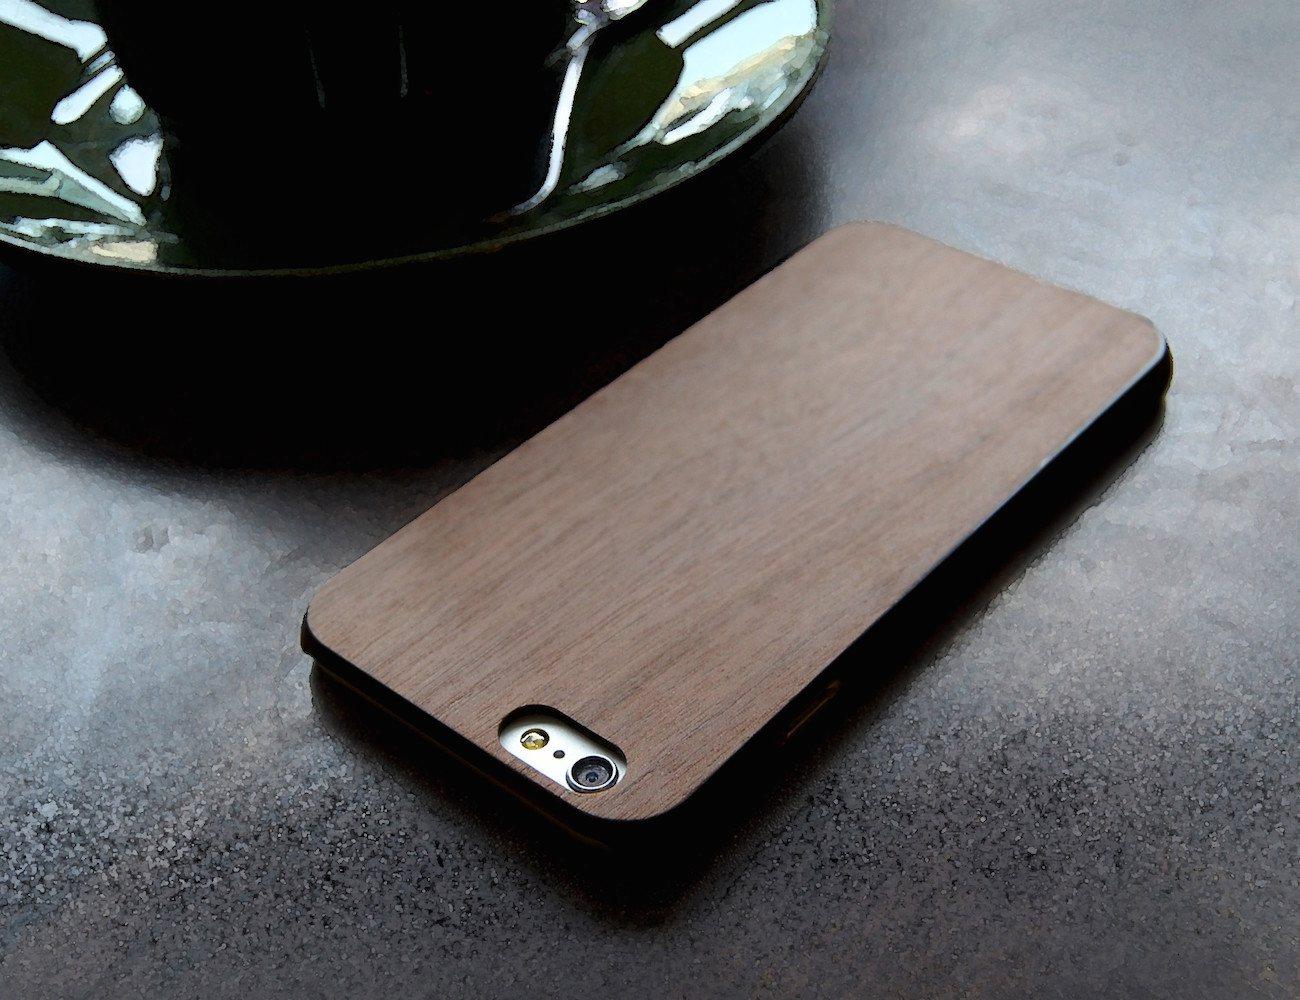 iphone-6-walnut-real-wood-slim-case-01